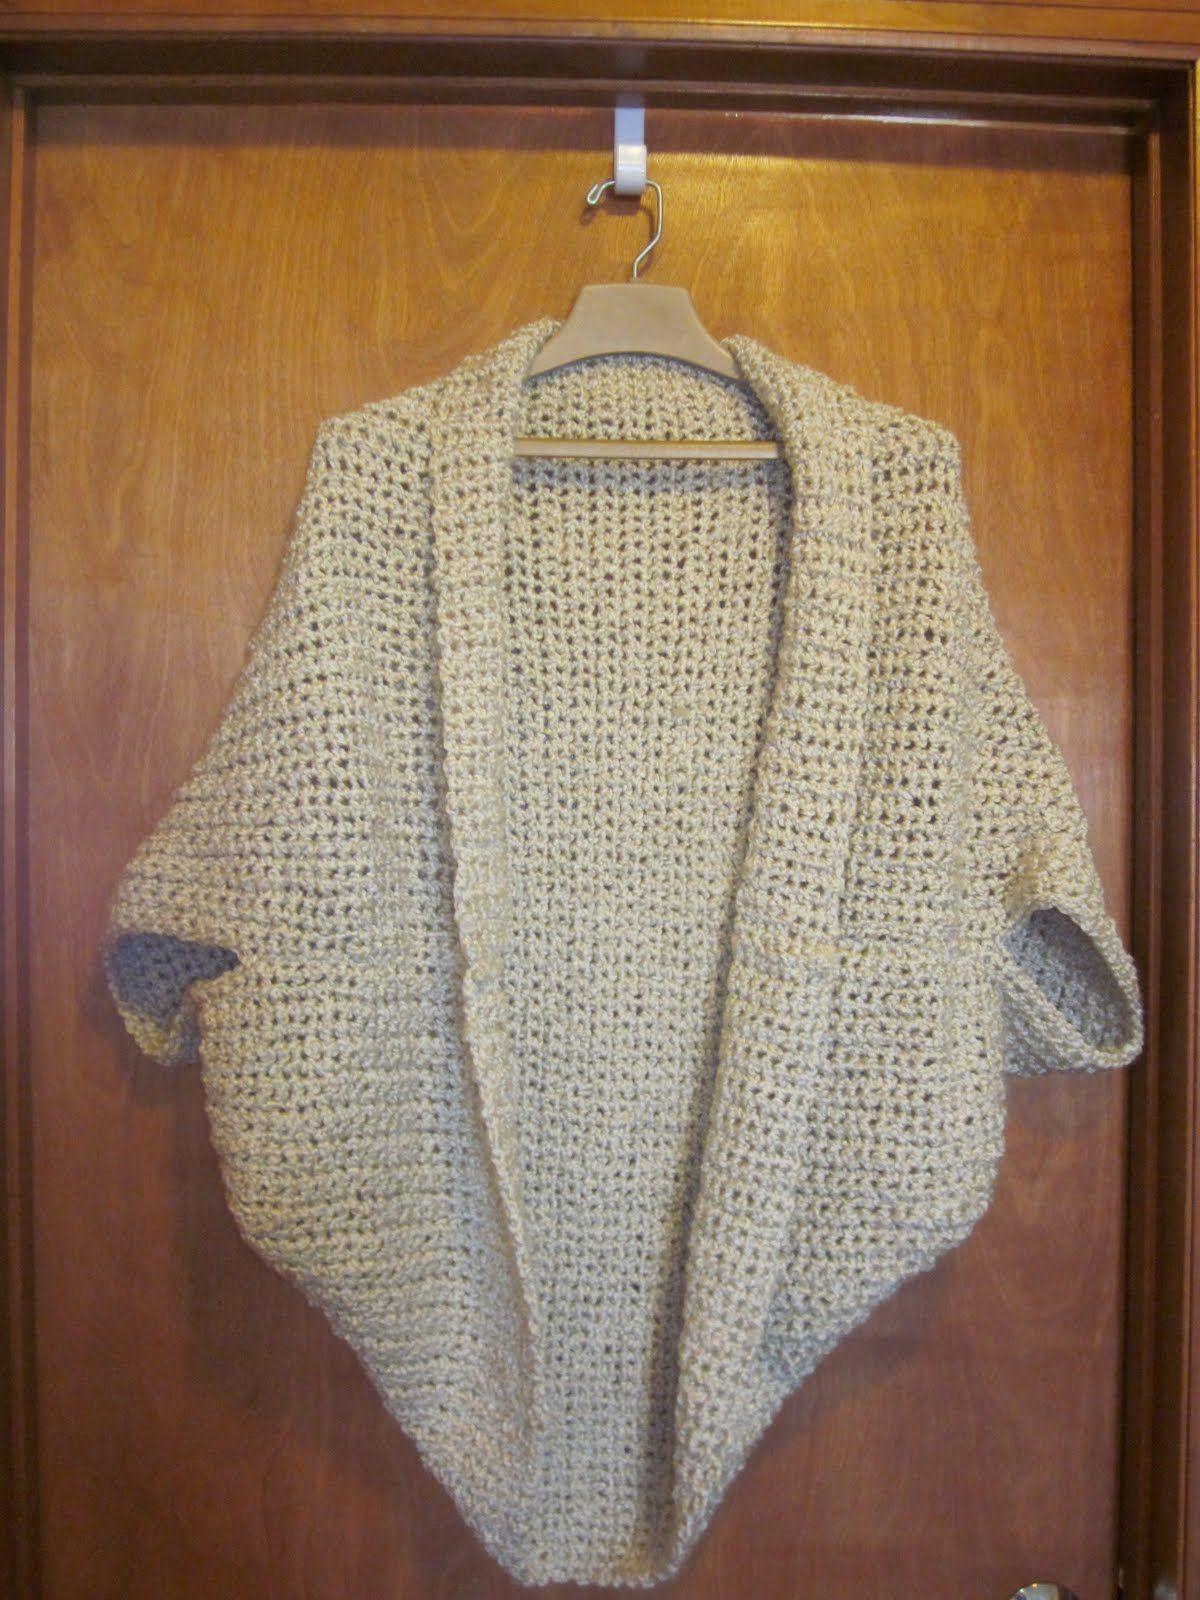 Crochet Cocoon Shrug Pattern Ideas | Pinterest | Crochet granny ...